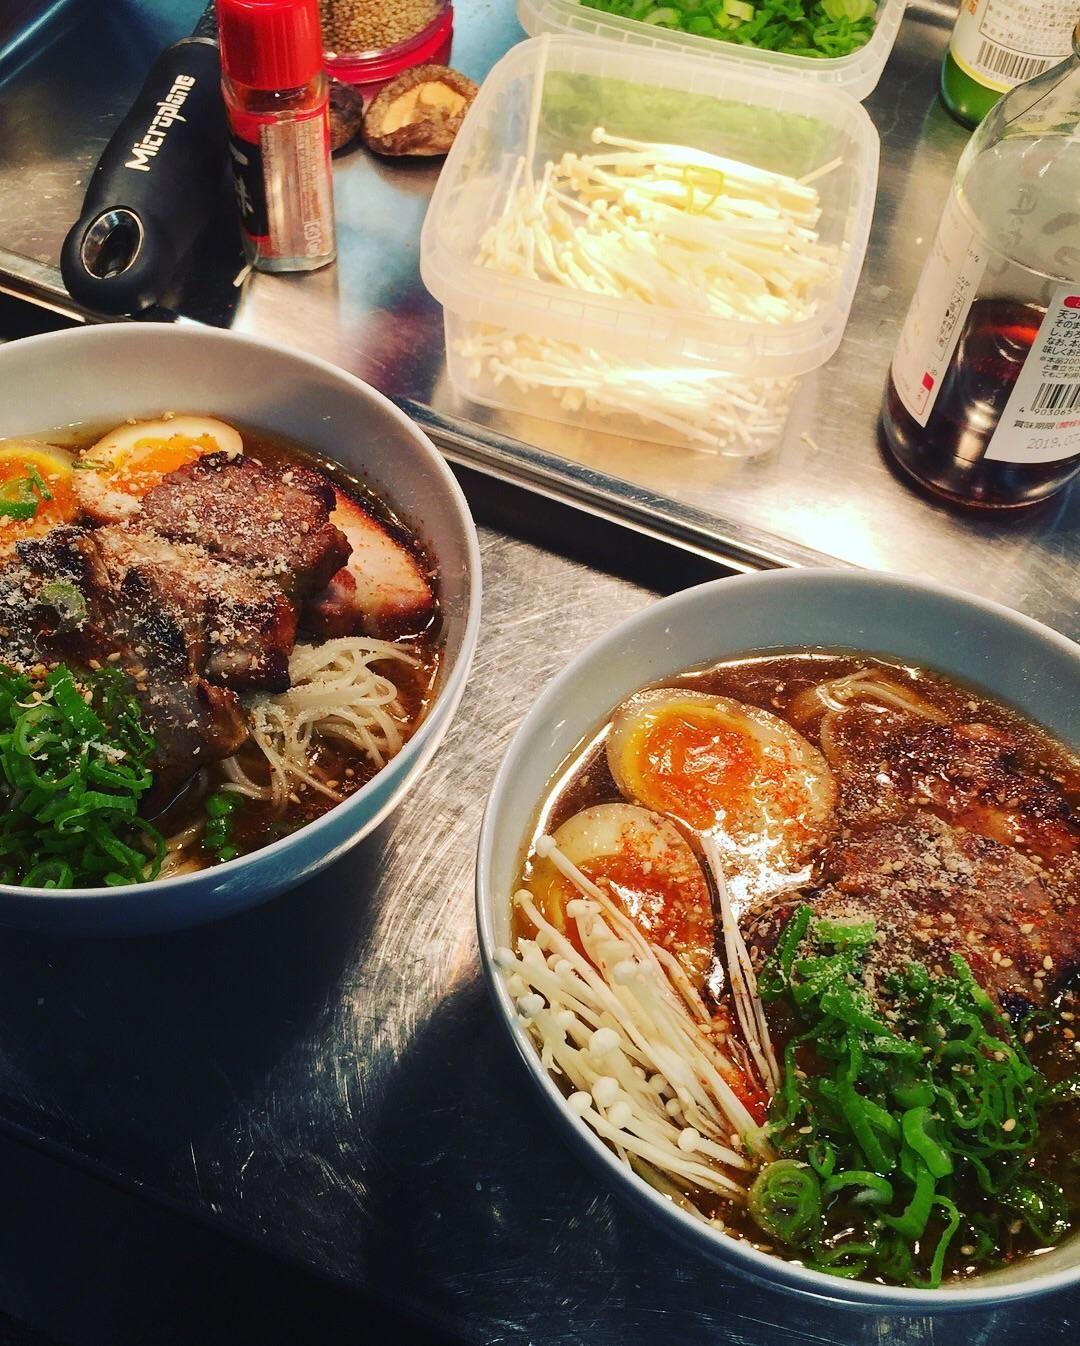 Homemade staff lunch shoyu miso ramen with porkbelly and soy eggs homemade staff lunch shoyu miso ramen with porkbelly and soy eggs food forumfinder Choice Image